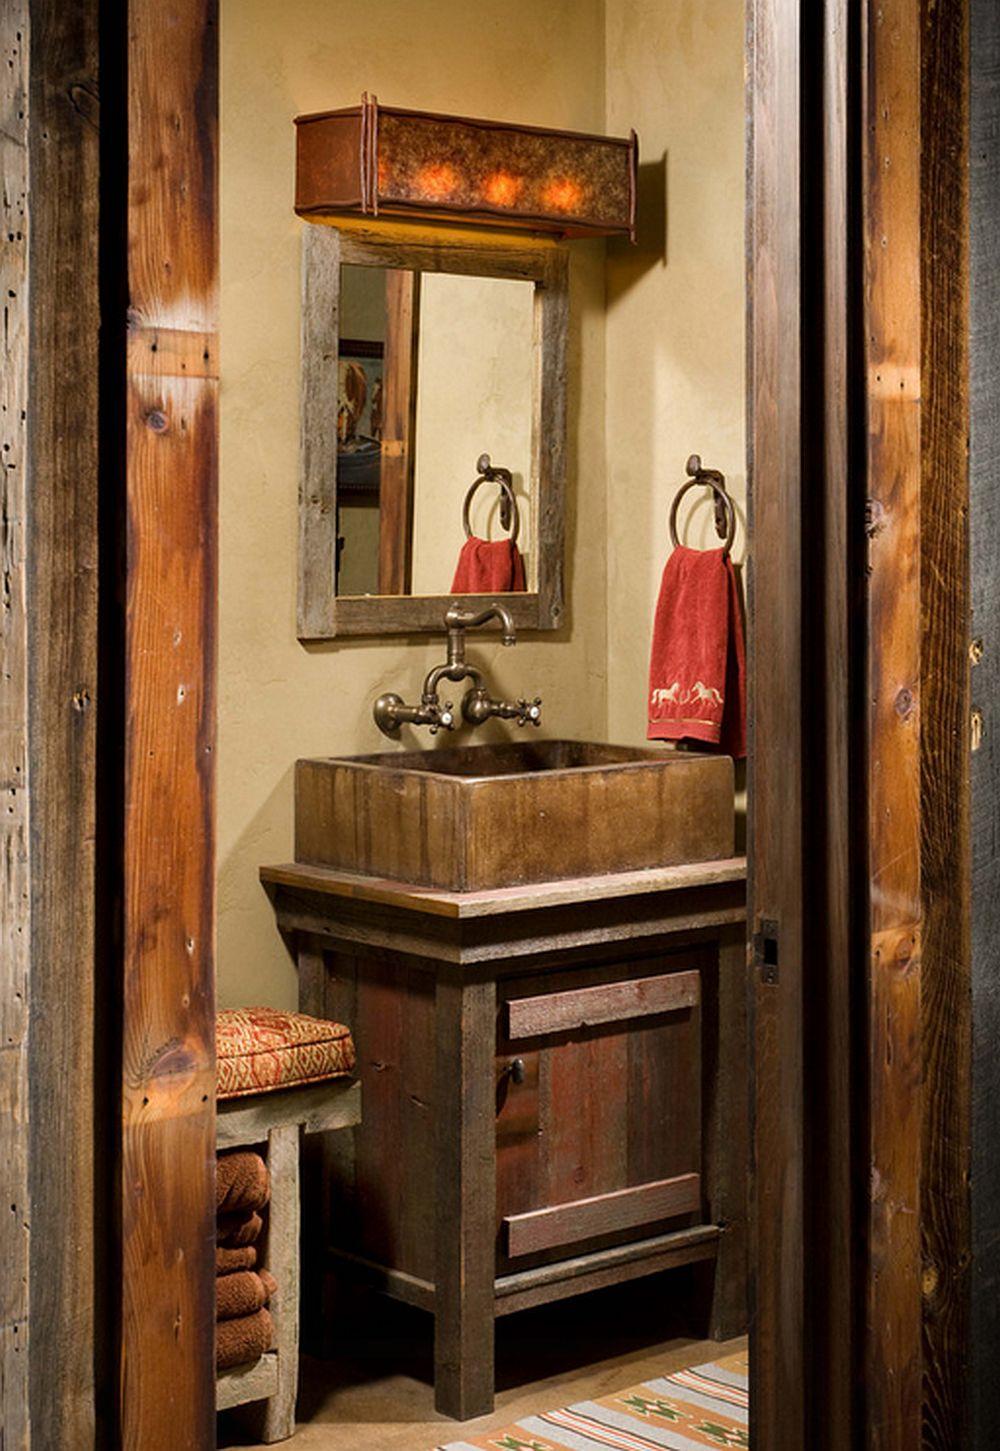 adelaparvu.com despre cabana din lemn vechi recuperat, cabana Swan Valley, Montana, RMT Architects (5)